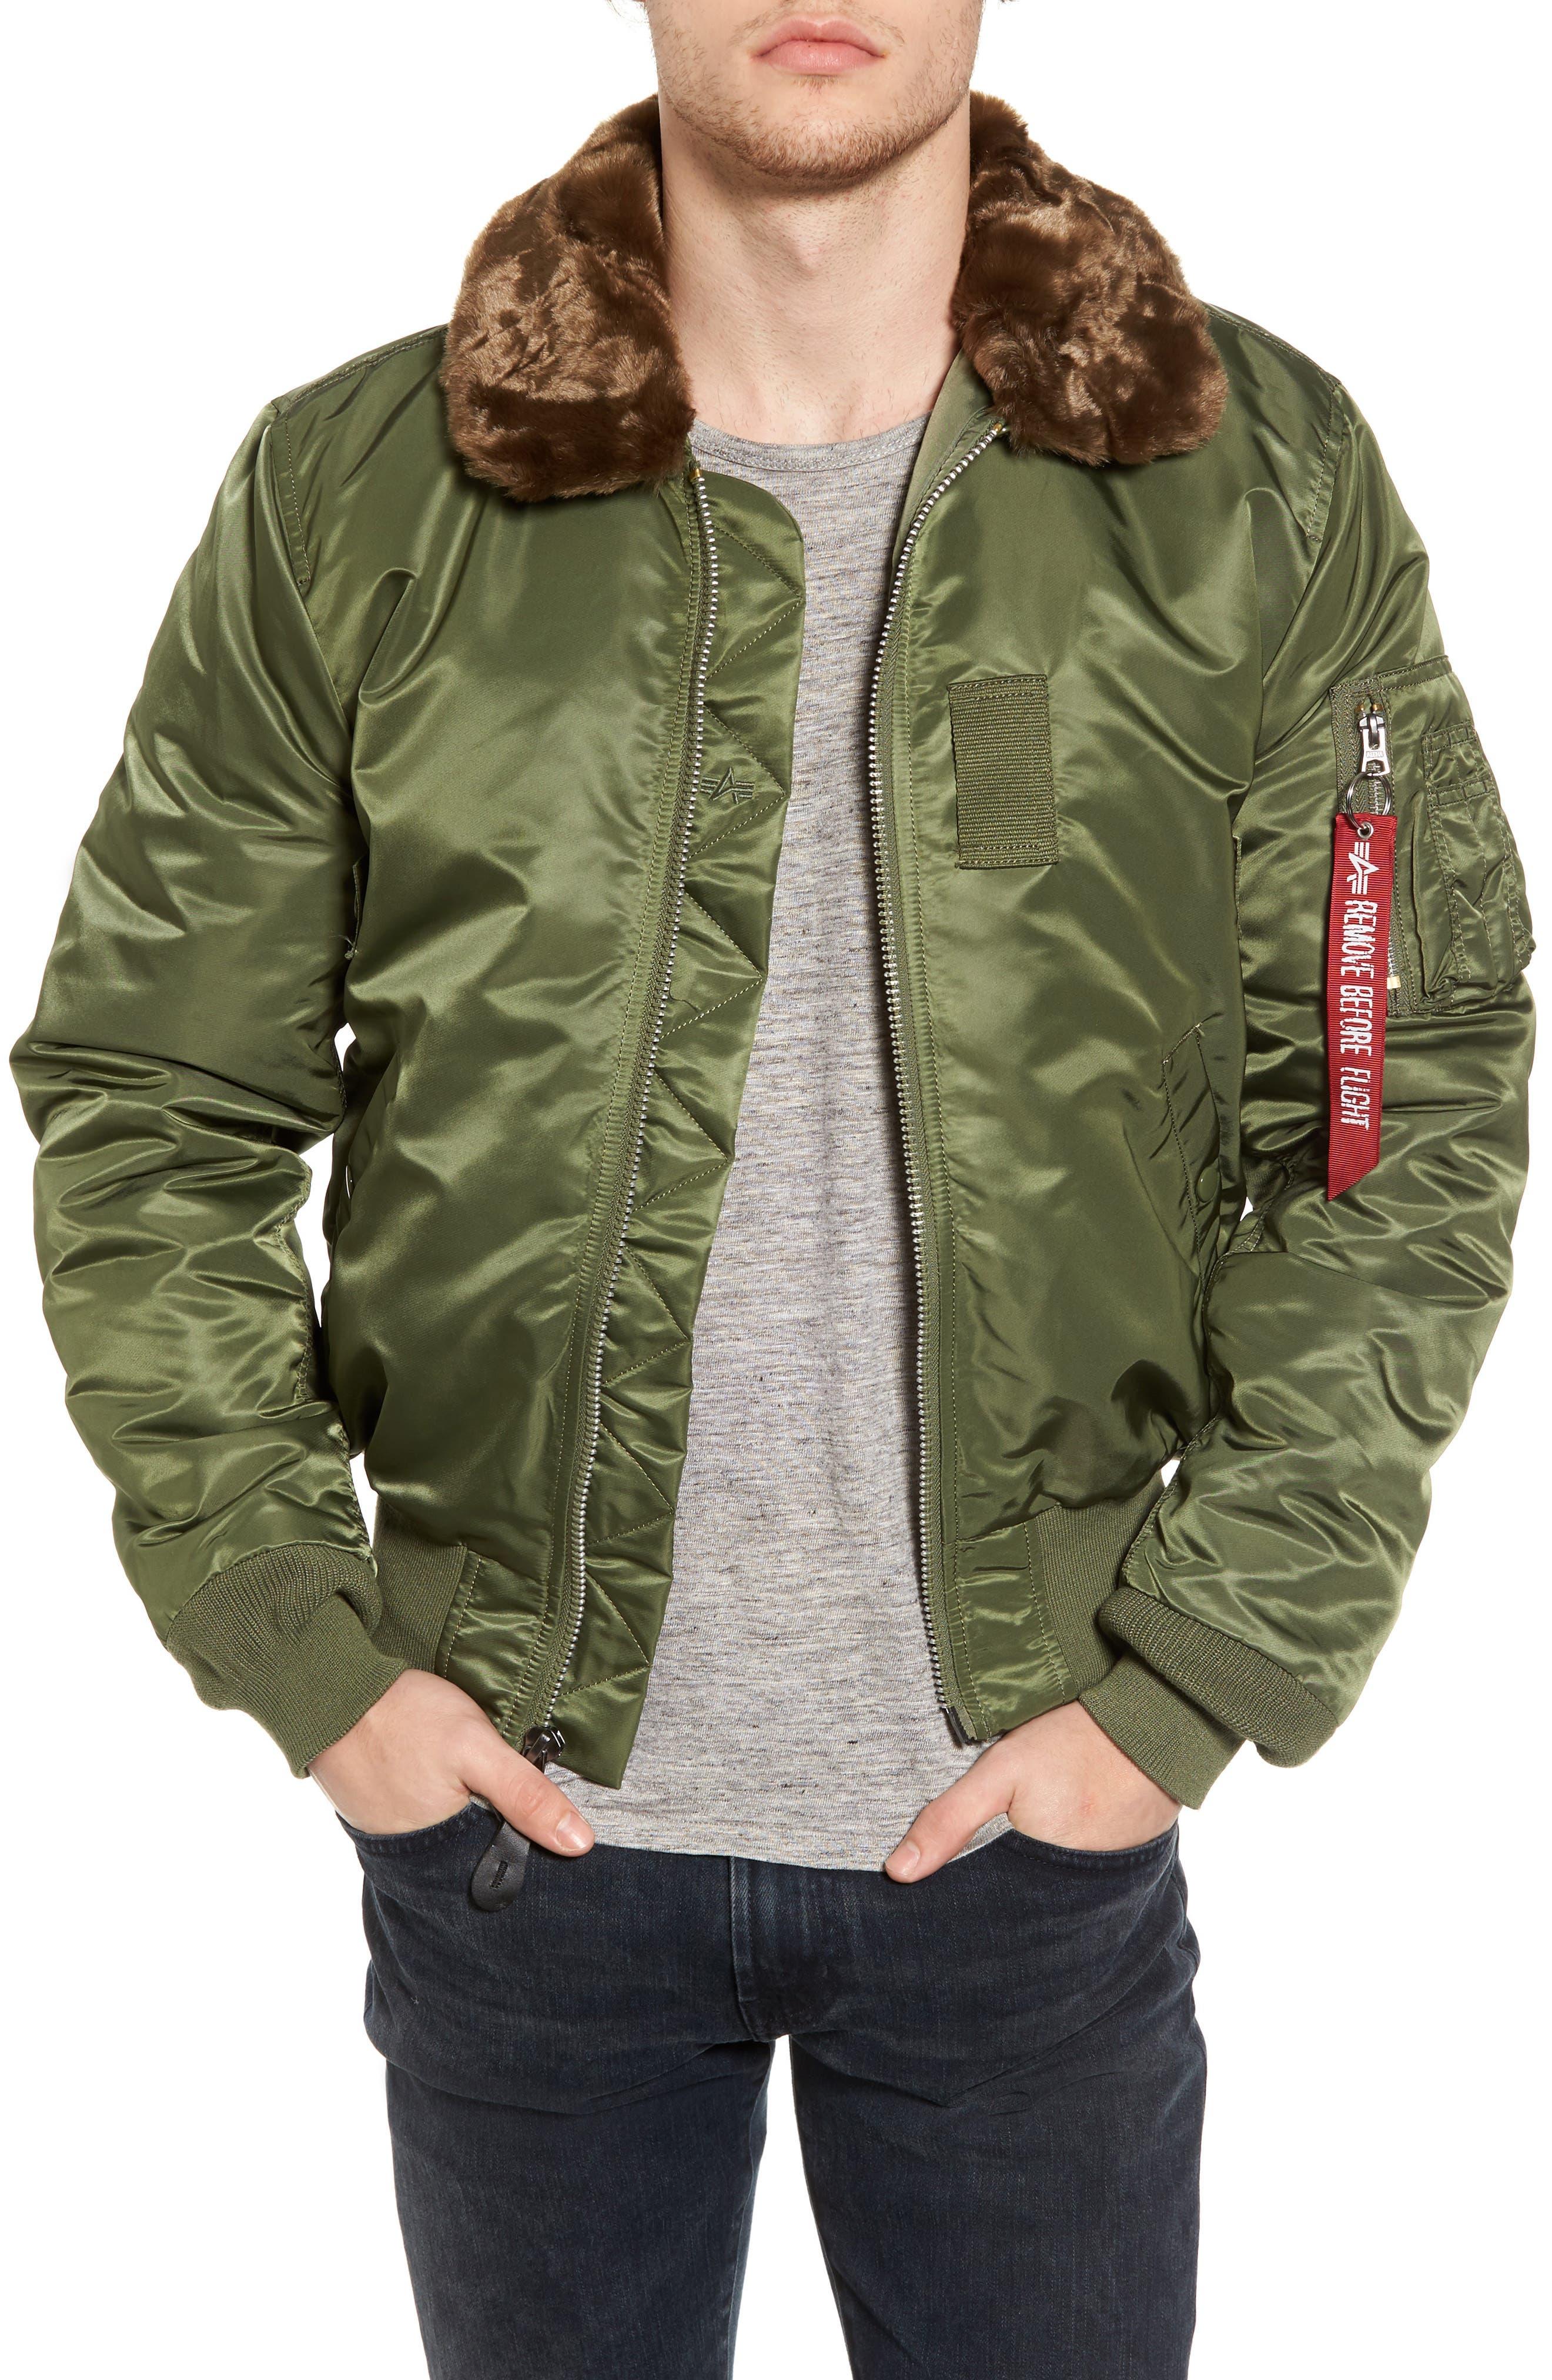 B-15 Removable Faux Fur Collar Flight Jacket,                             Main thumbnail 1, color,                             351